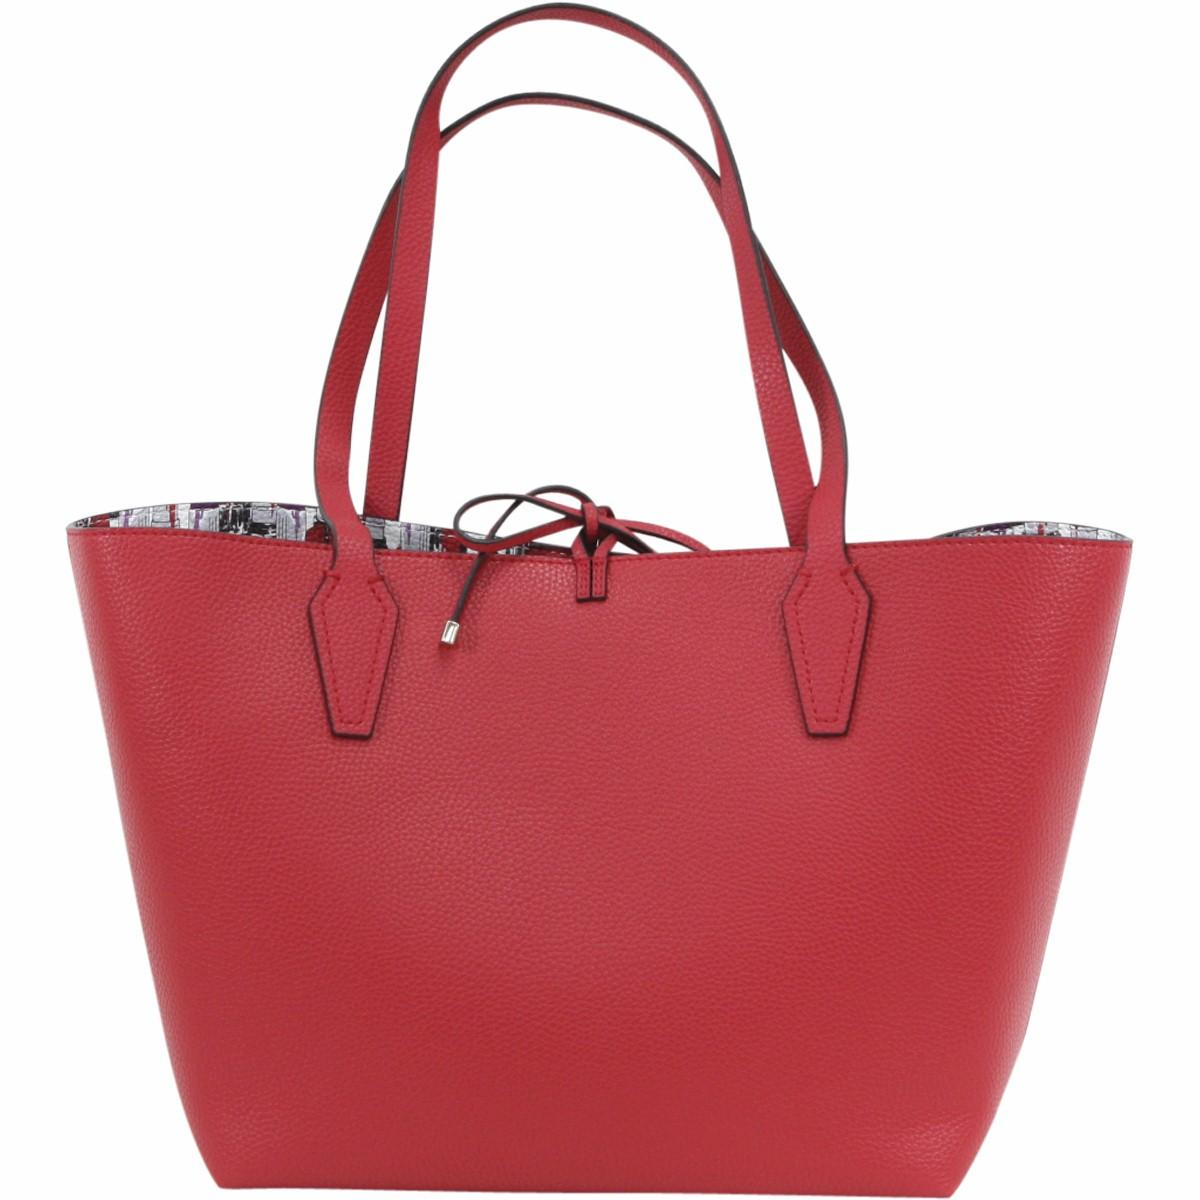 7ff1ddc59 Guess Women's Bobbi Inside-Out Large Reversible Tote Handbag Set by Guess